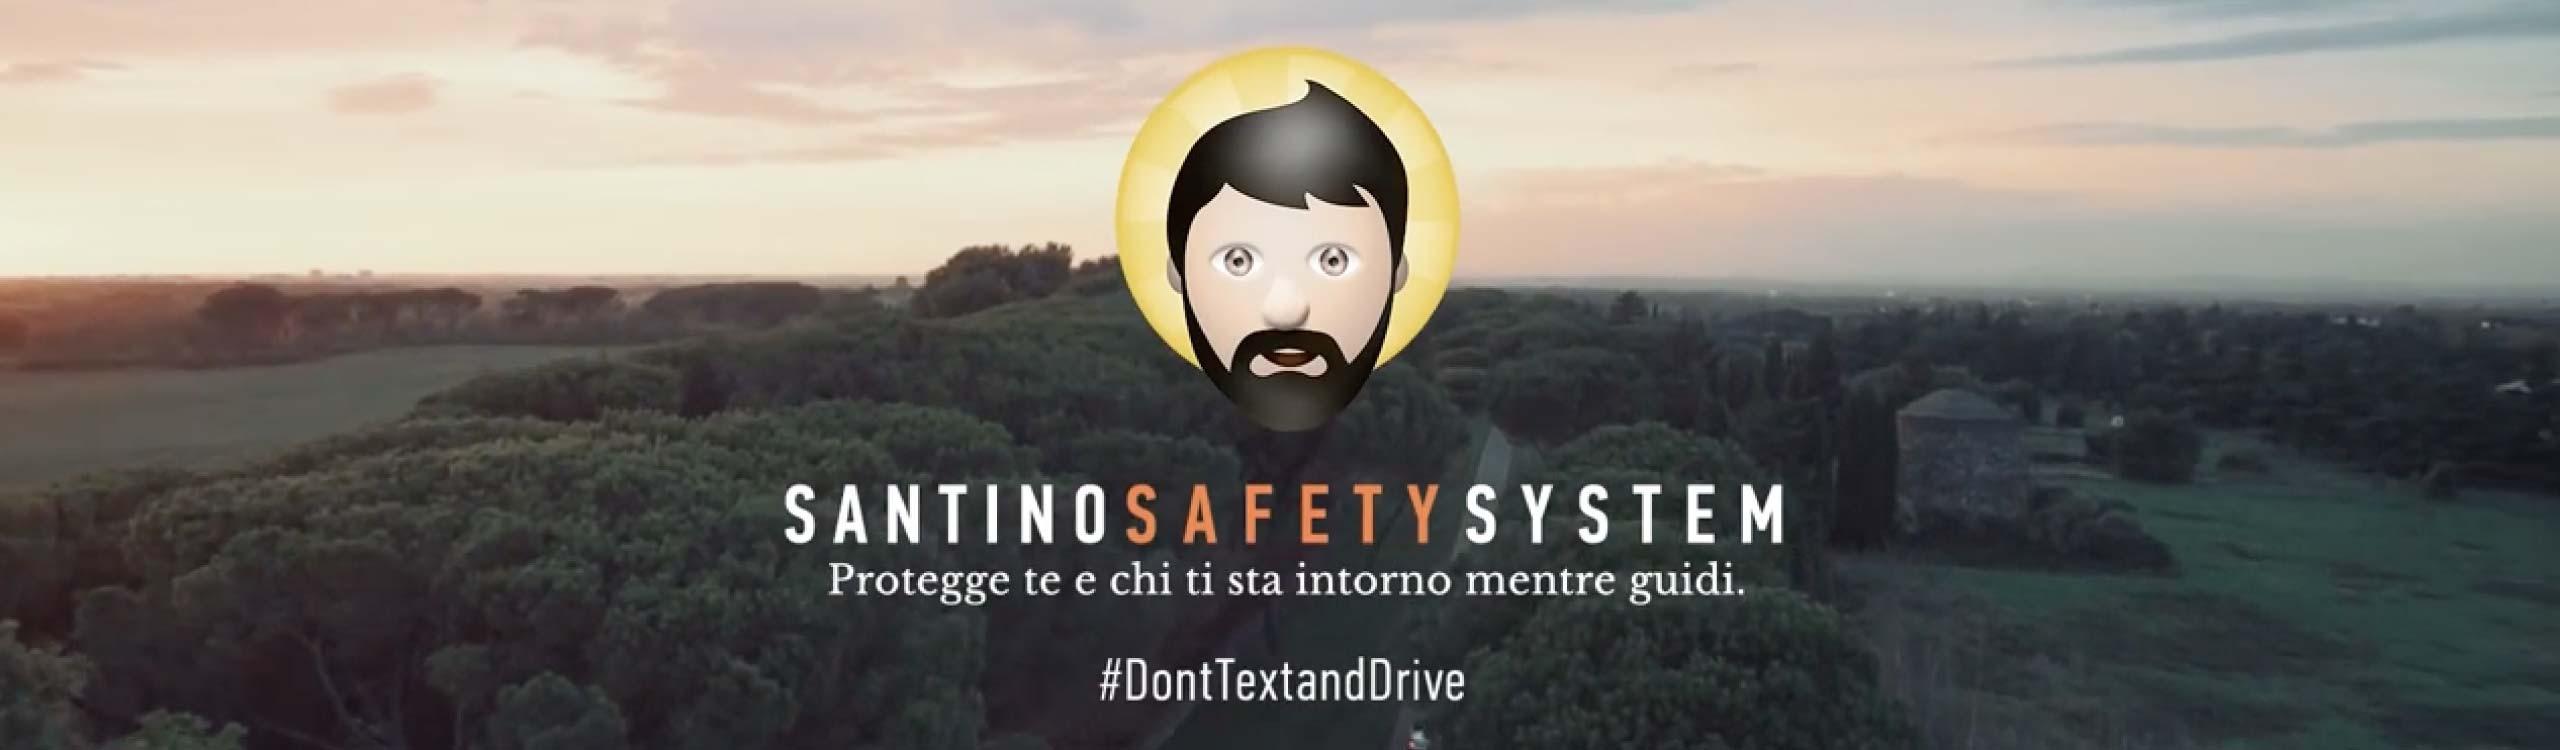 groupama-santino-safety-car-mis-gafas-de-pasta-destacado